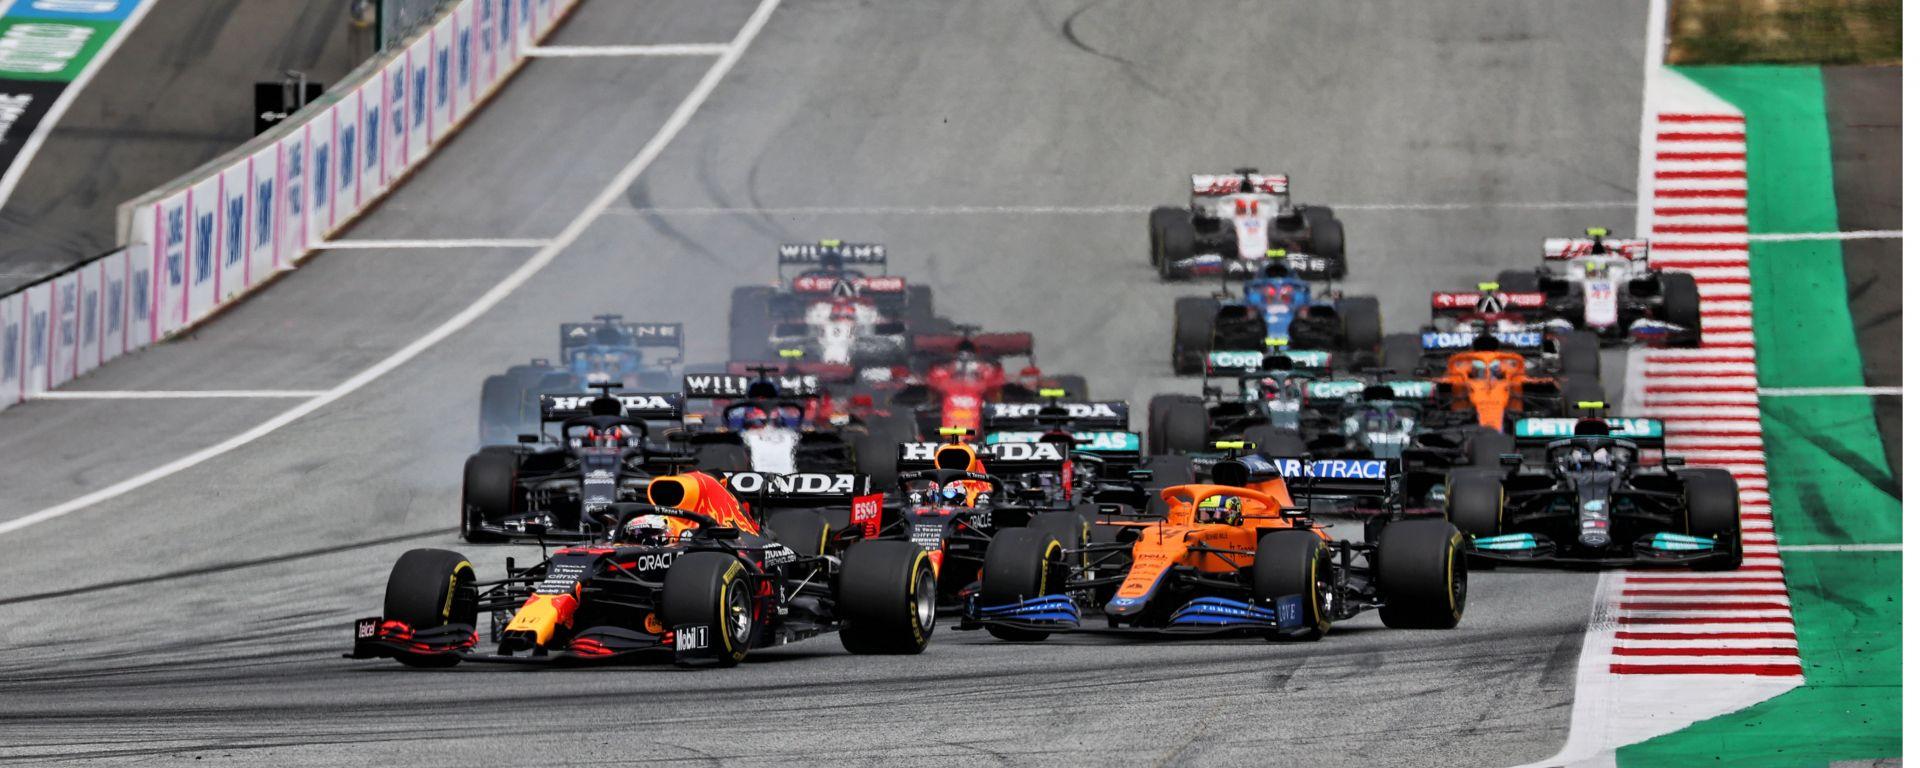 F1 GP Austria 2021, Spielberg: La partenza della gara